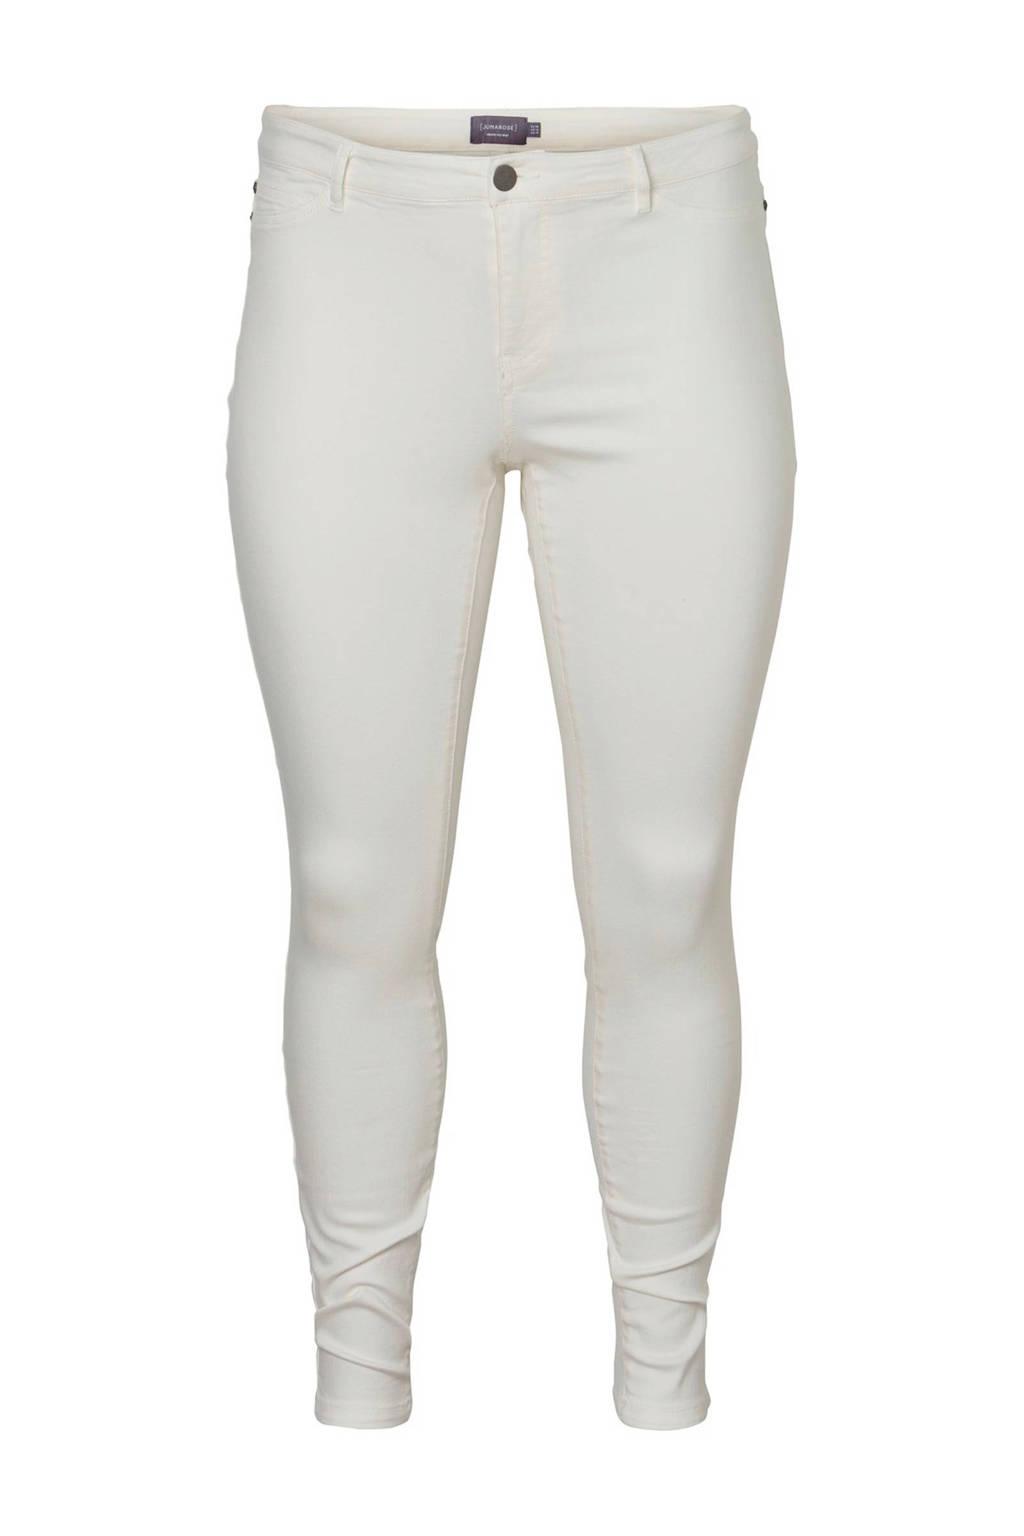 JUNAROSE Molly slim fit jeans wit, Wit